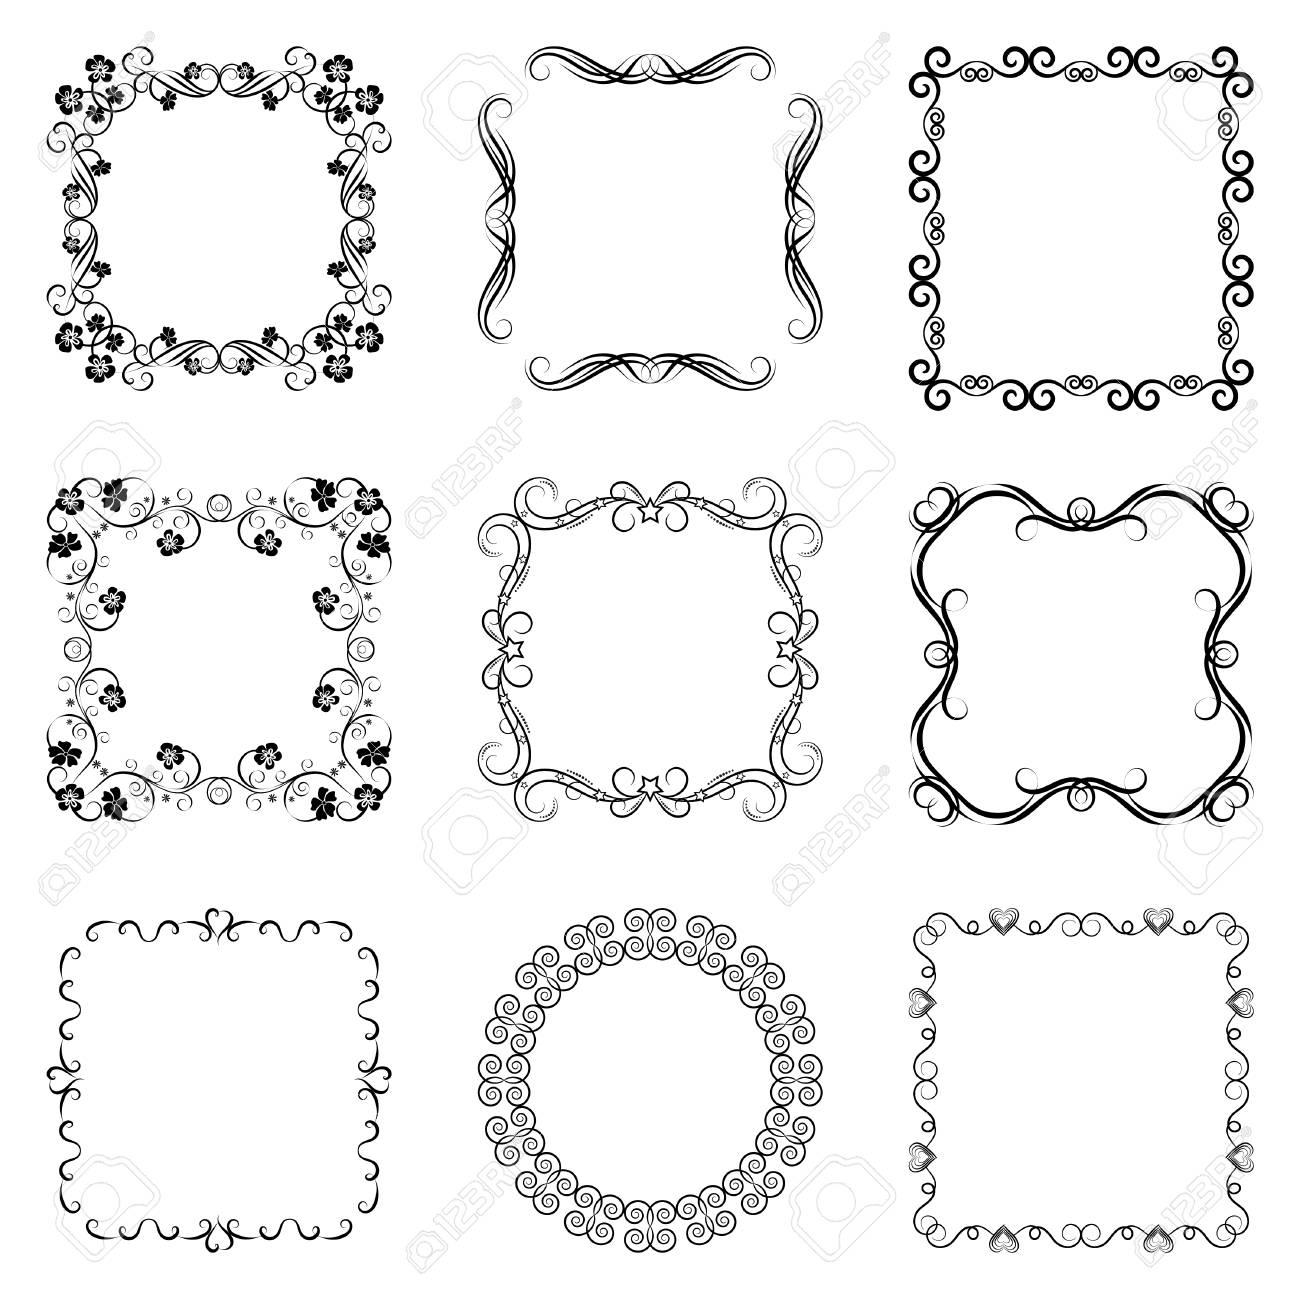 Vintage Swirl Frame Set. Abstract Black And White Ornate Frames ...